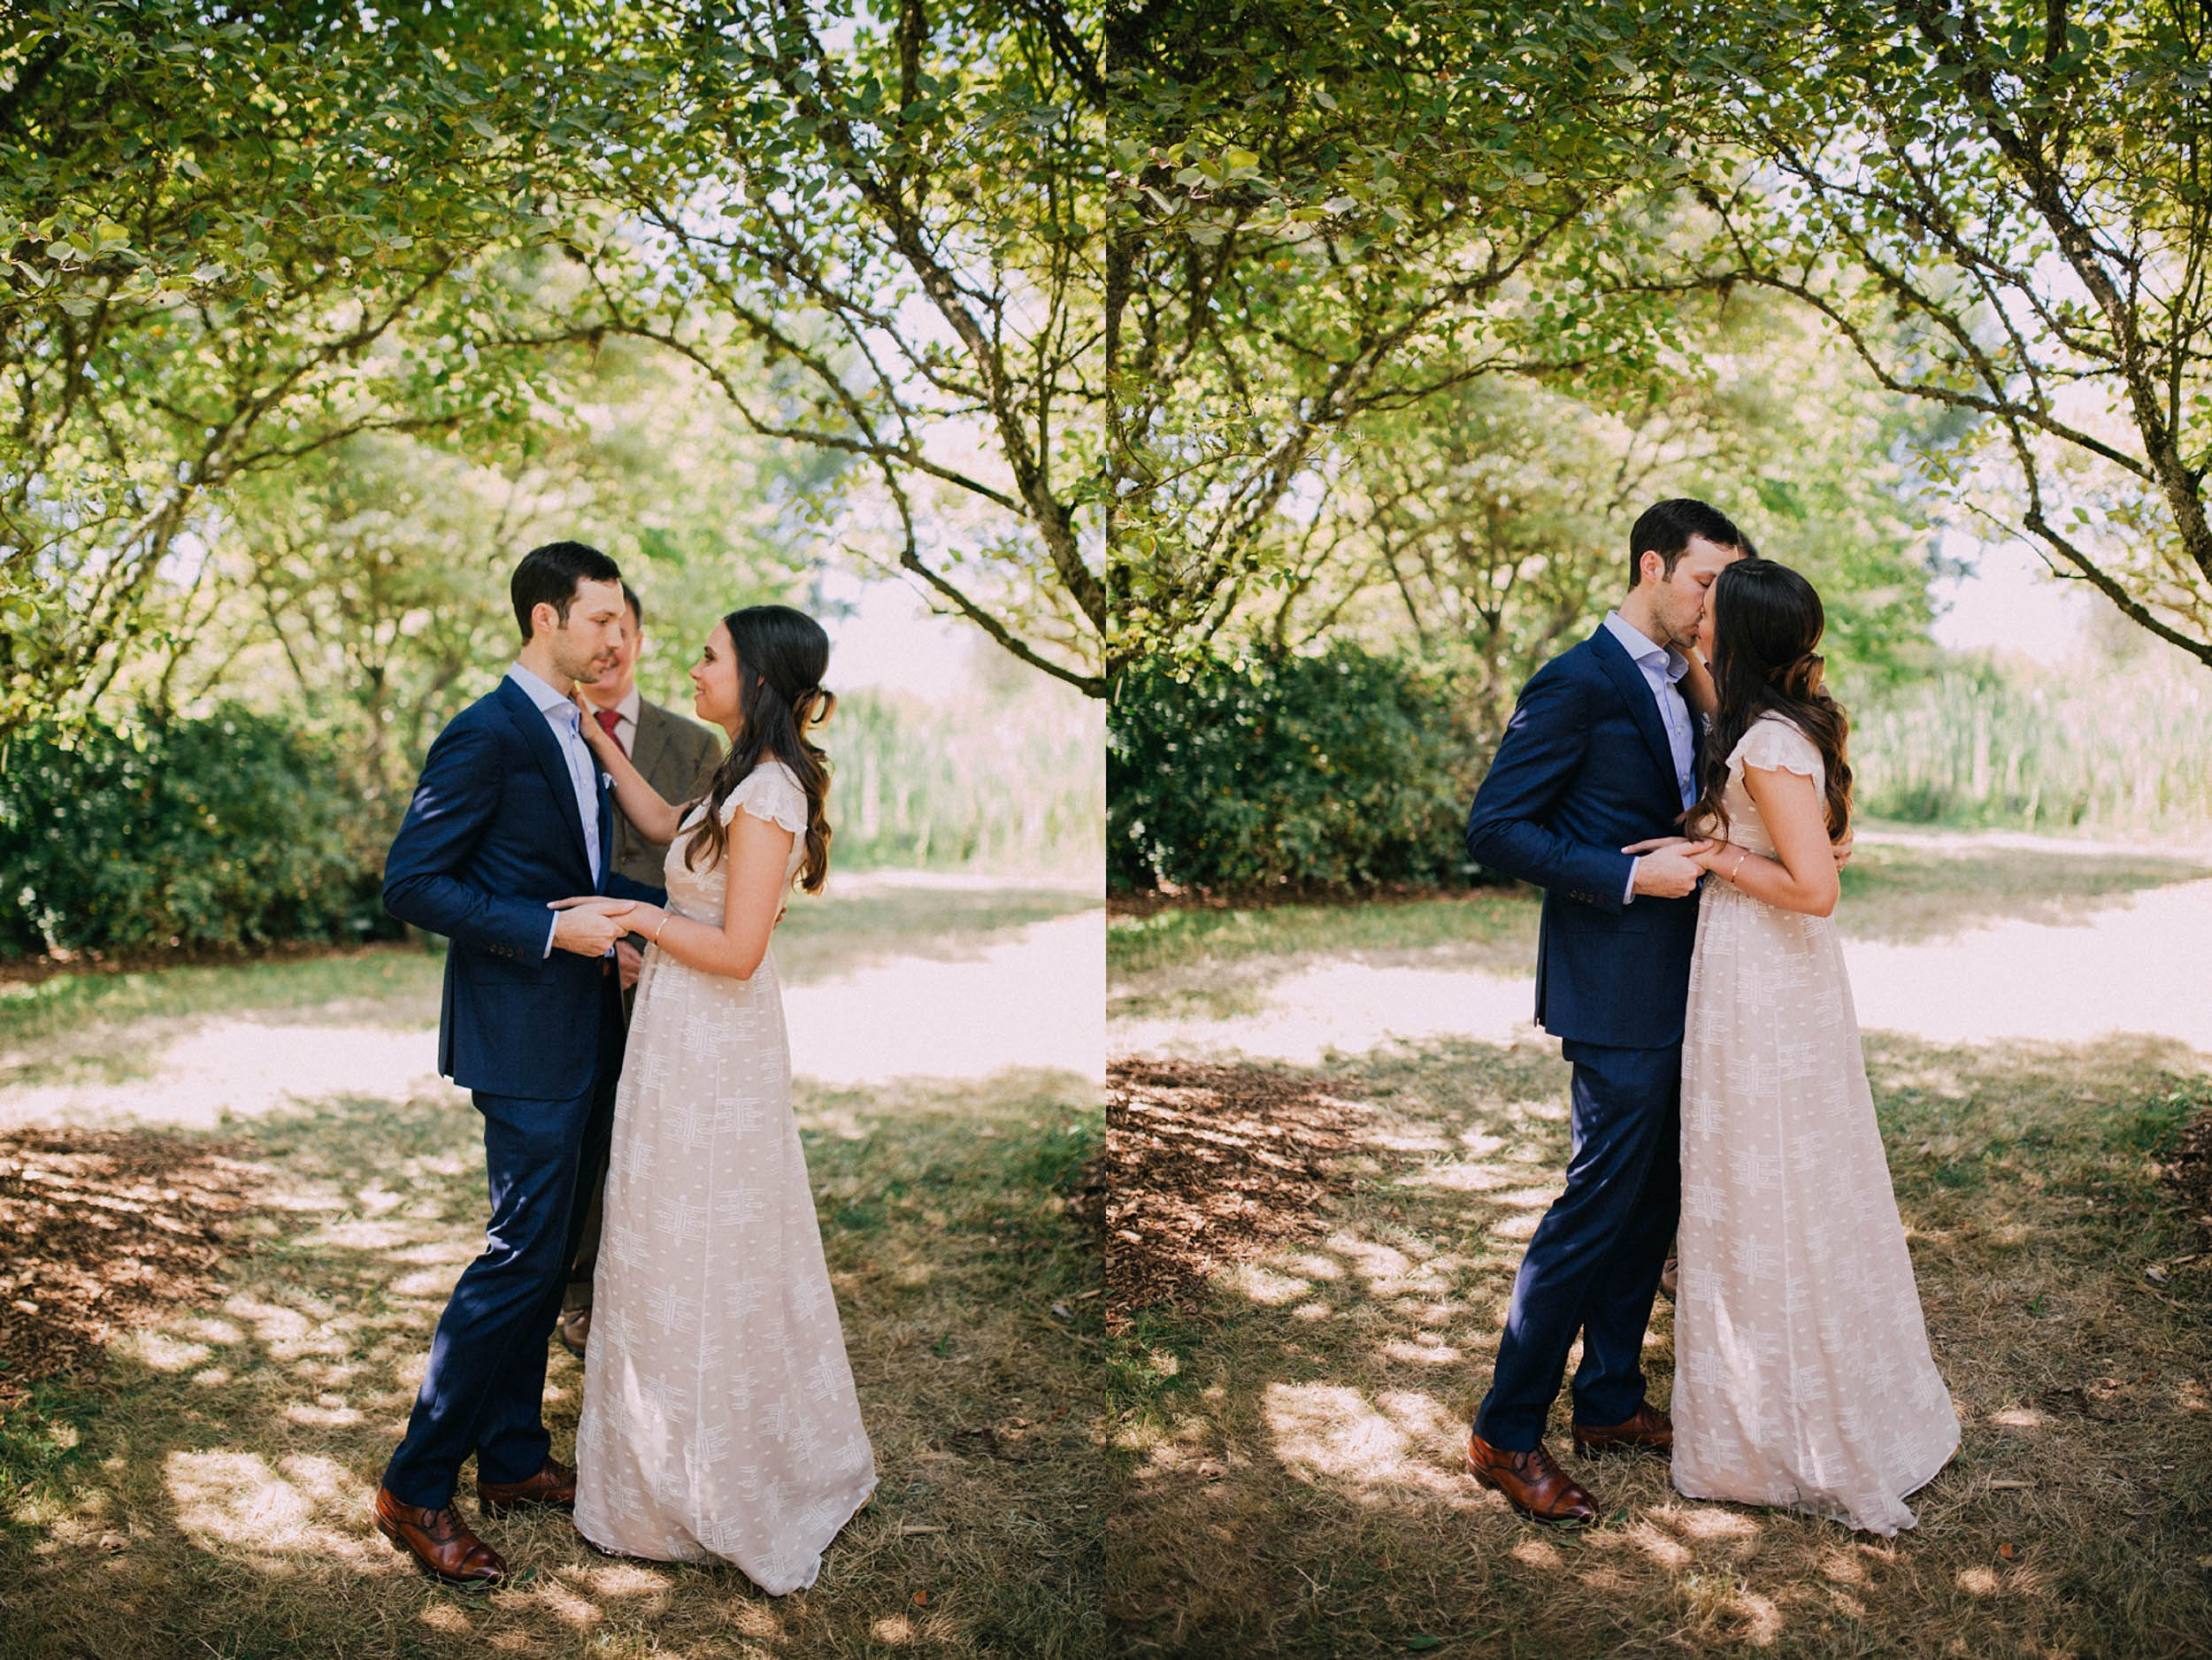 Seattle courthouse and wedding photographer ballard wedding ashley vos-5.jpg